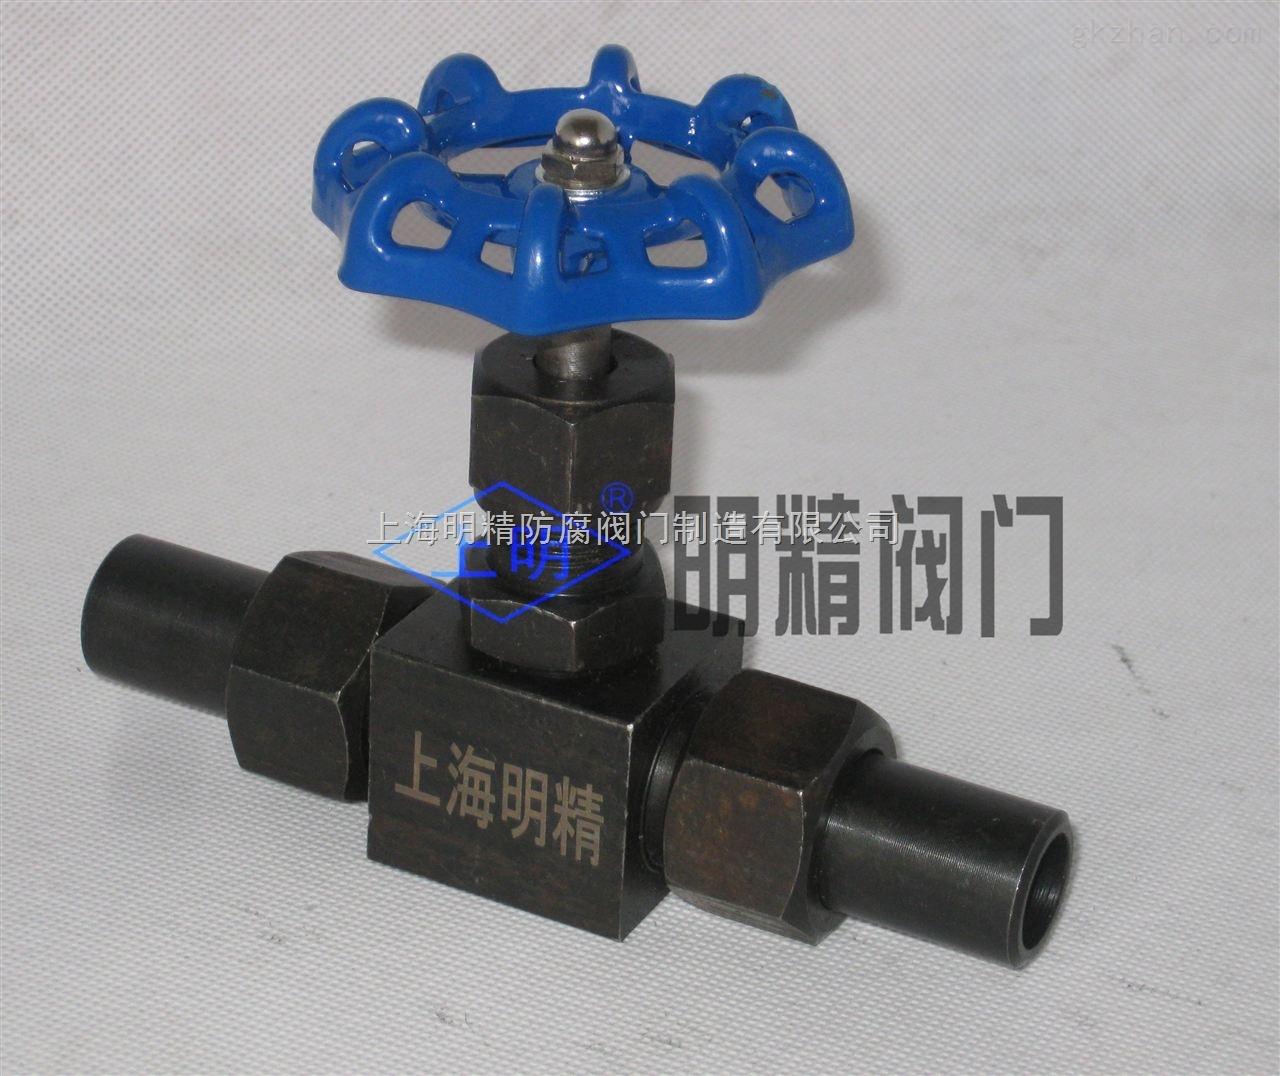 j23w型 j23w铬镍不锈钢焊接针形阀 直通型焊接针型阀 不锈钢针型阀图片